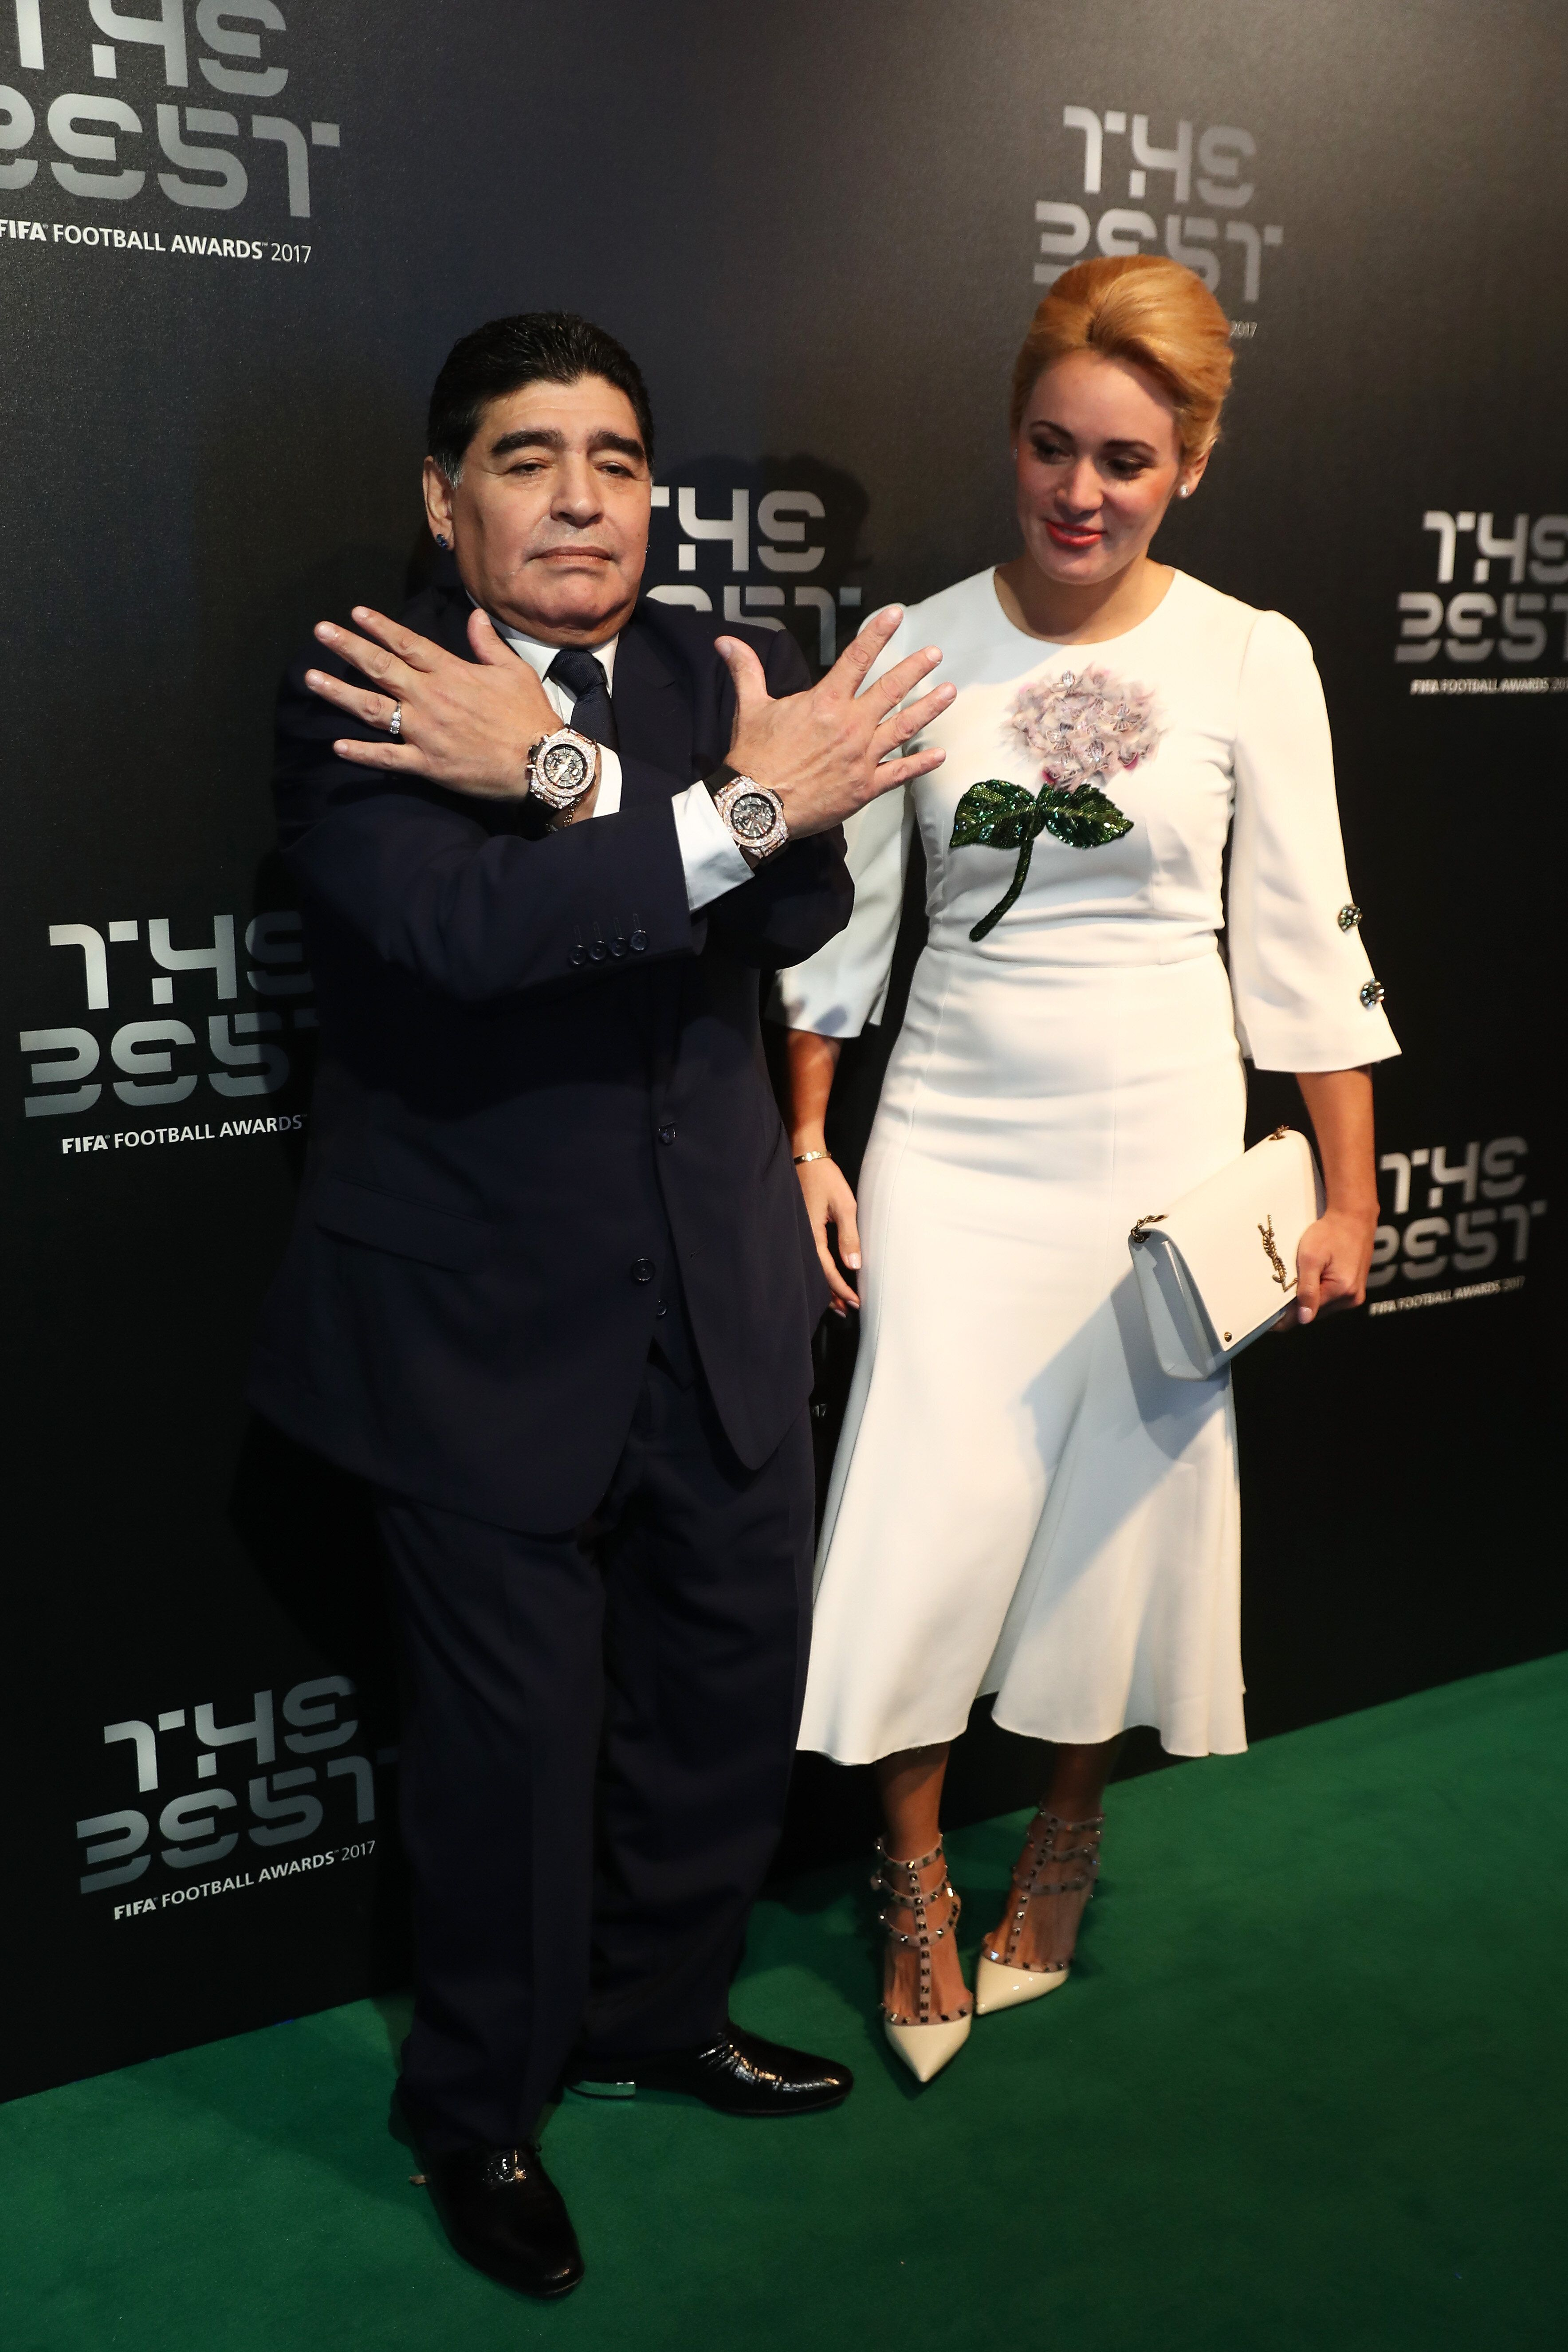 La gran incógnita de la herencia de Maradona